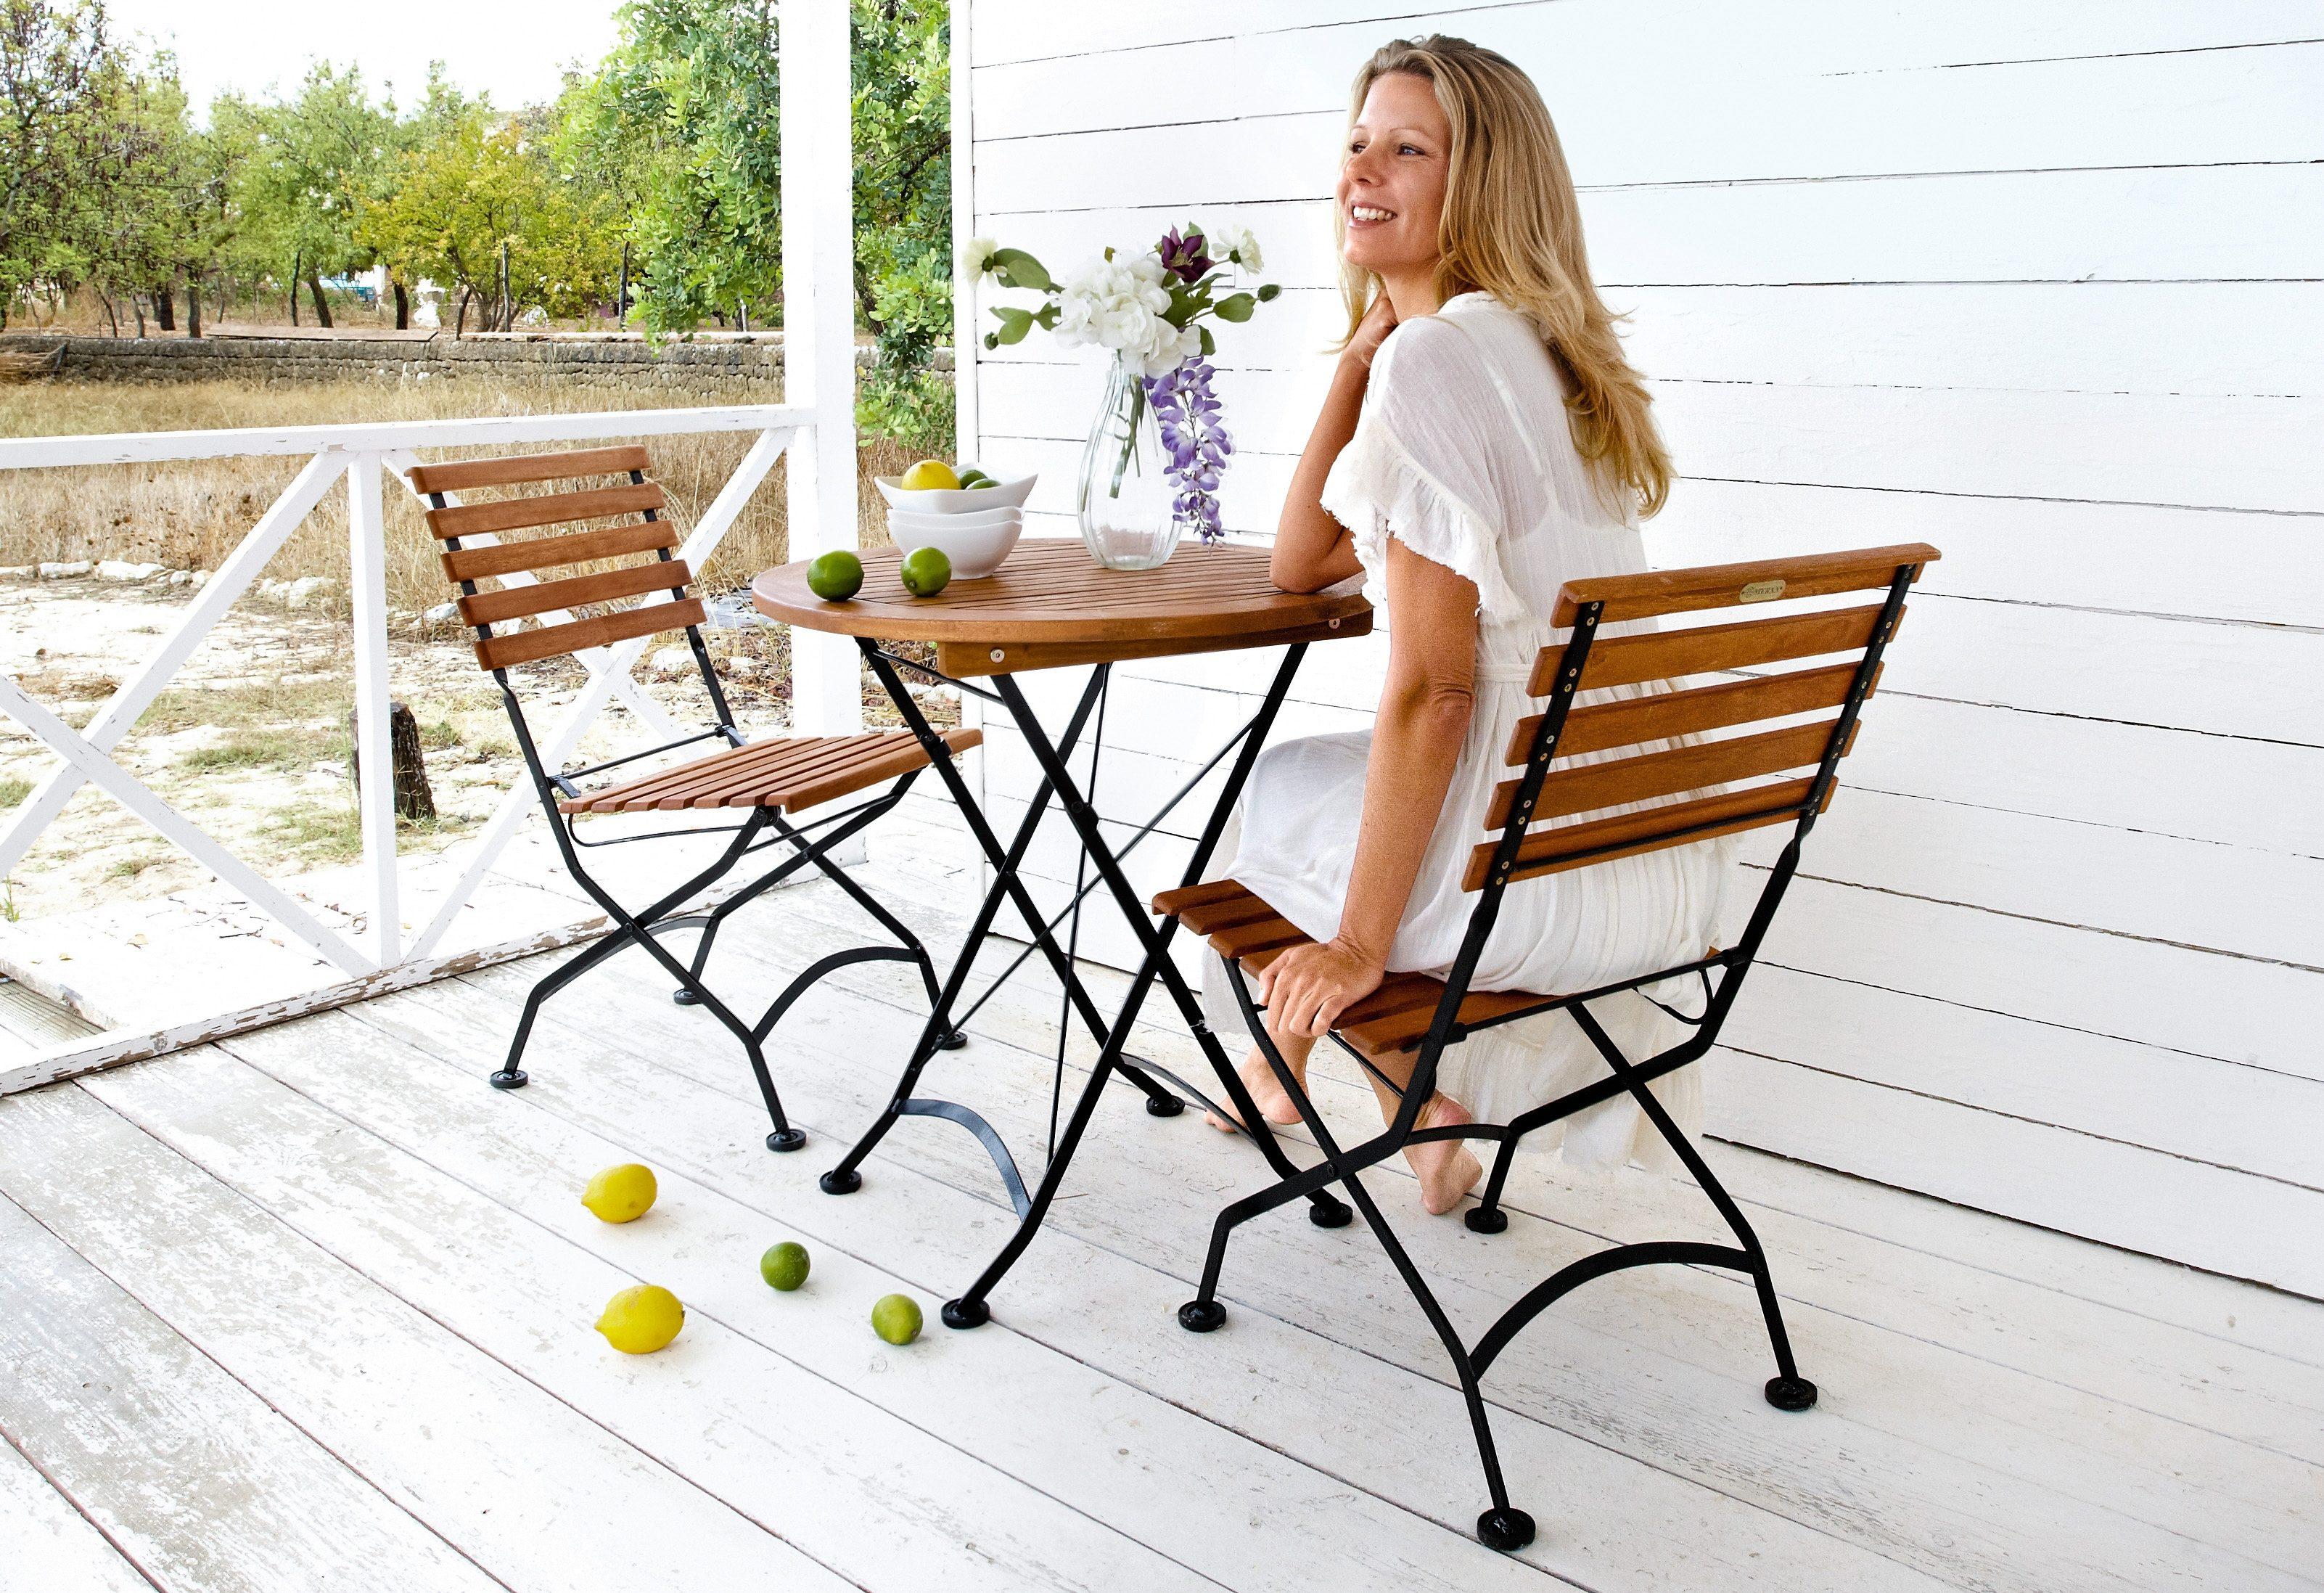 3-tgl. Gartenmöbelset »Schlossgarten«, 2 Stühle, Tisch Ø 70 cm,Stahl/Eukalyptusholz, klappbar